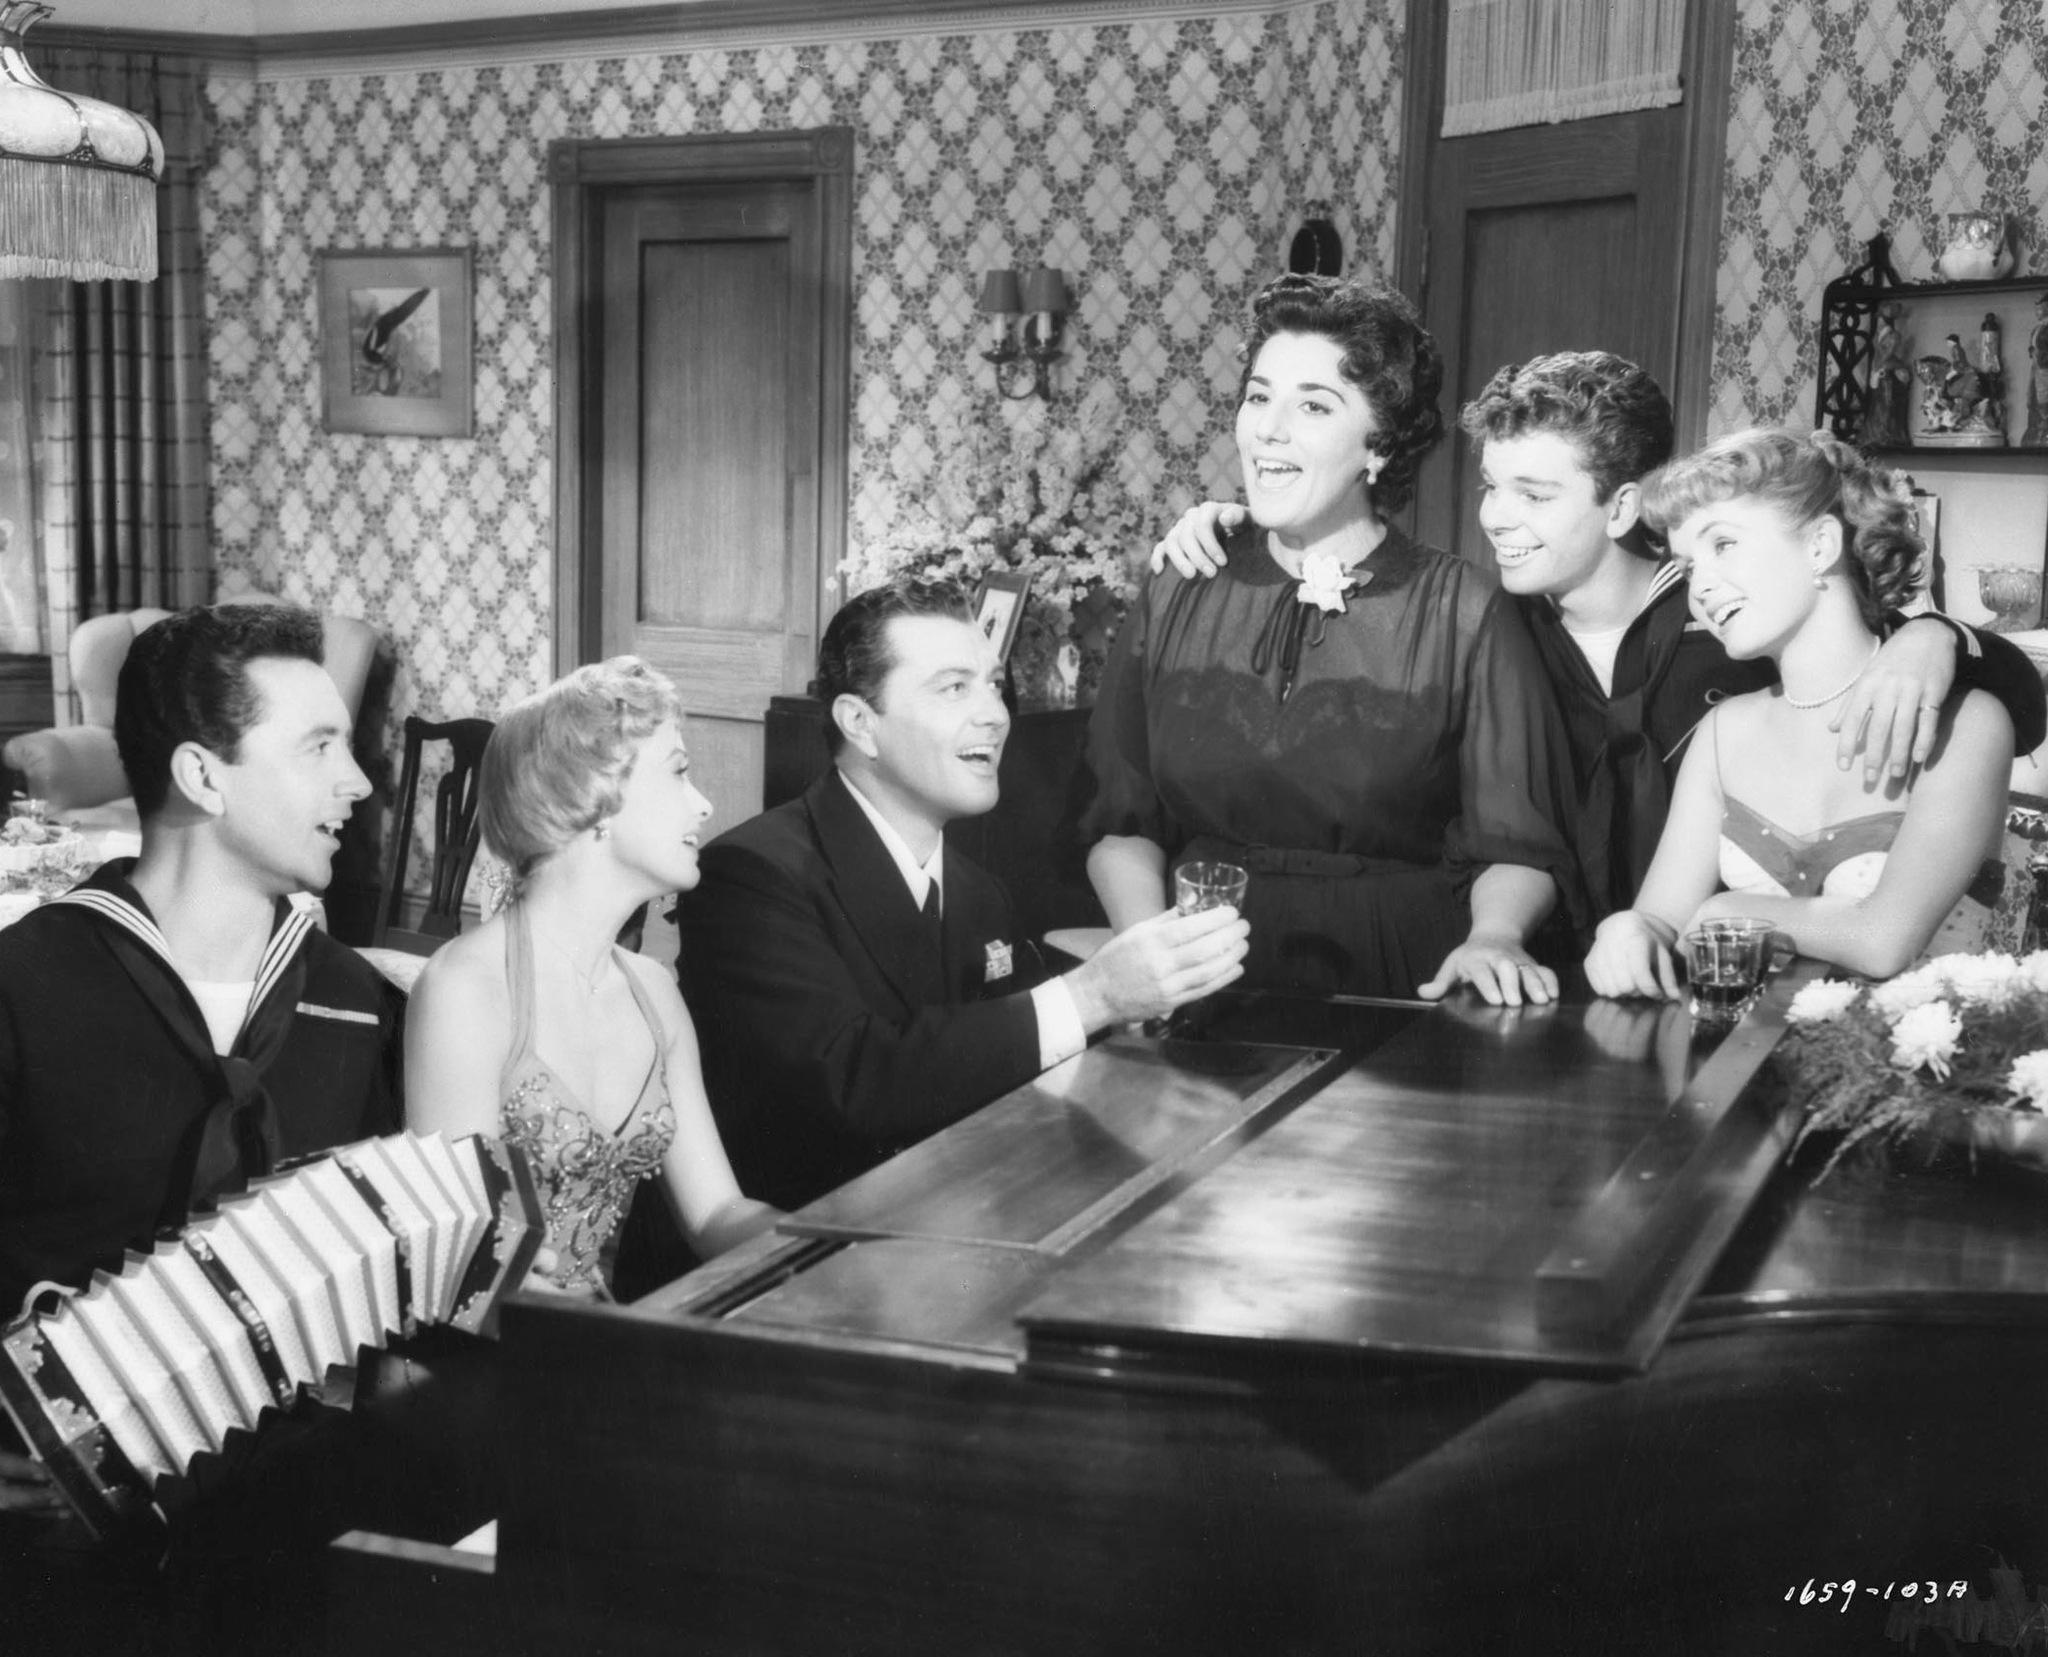 Debbie Reynolds, Jane Powell, Kay Armen, Vic Damone, Tony Martin, and Russ Tamblyn in Hit the Deck (1955)